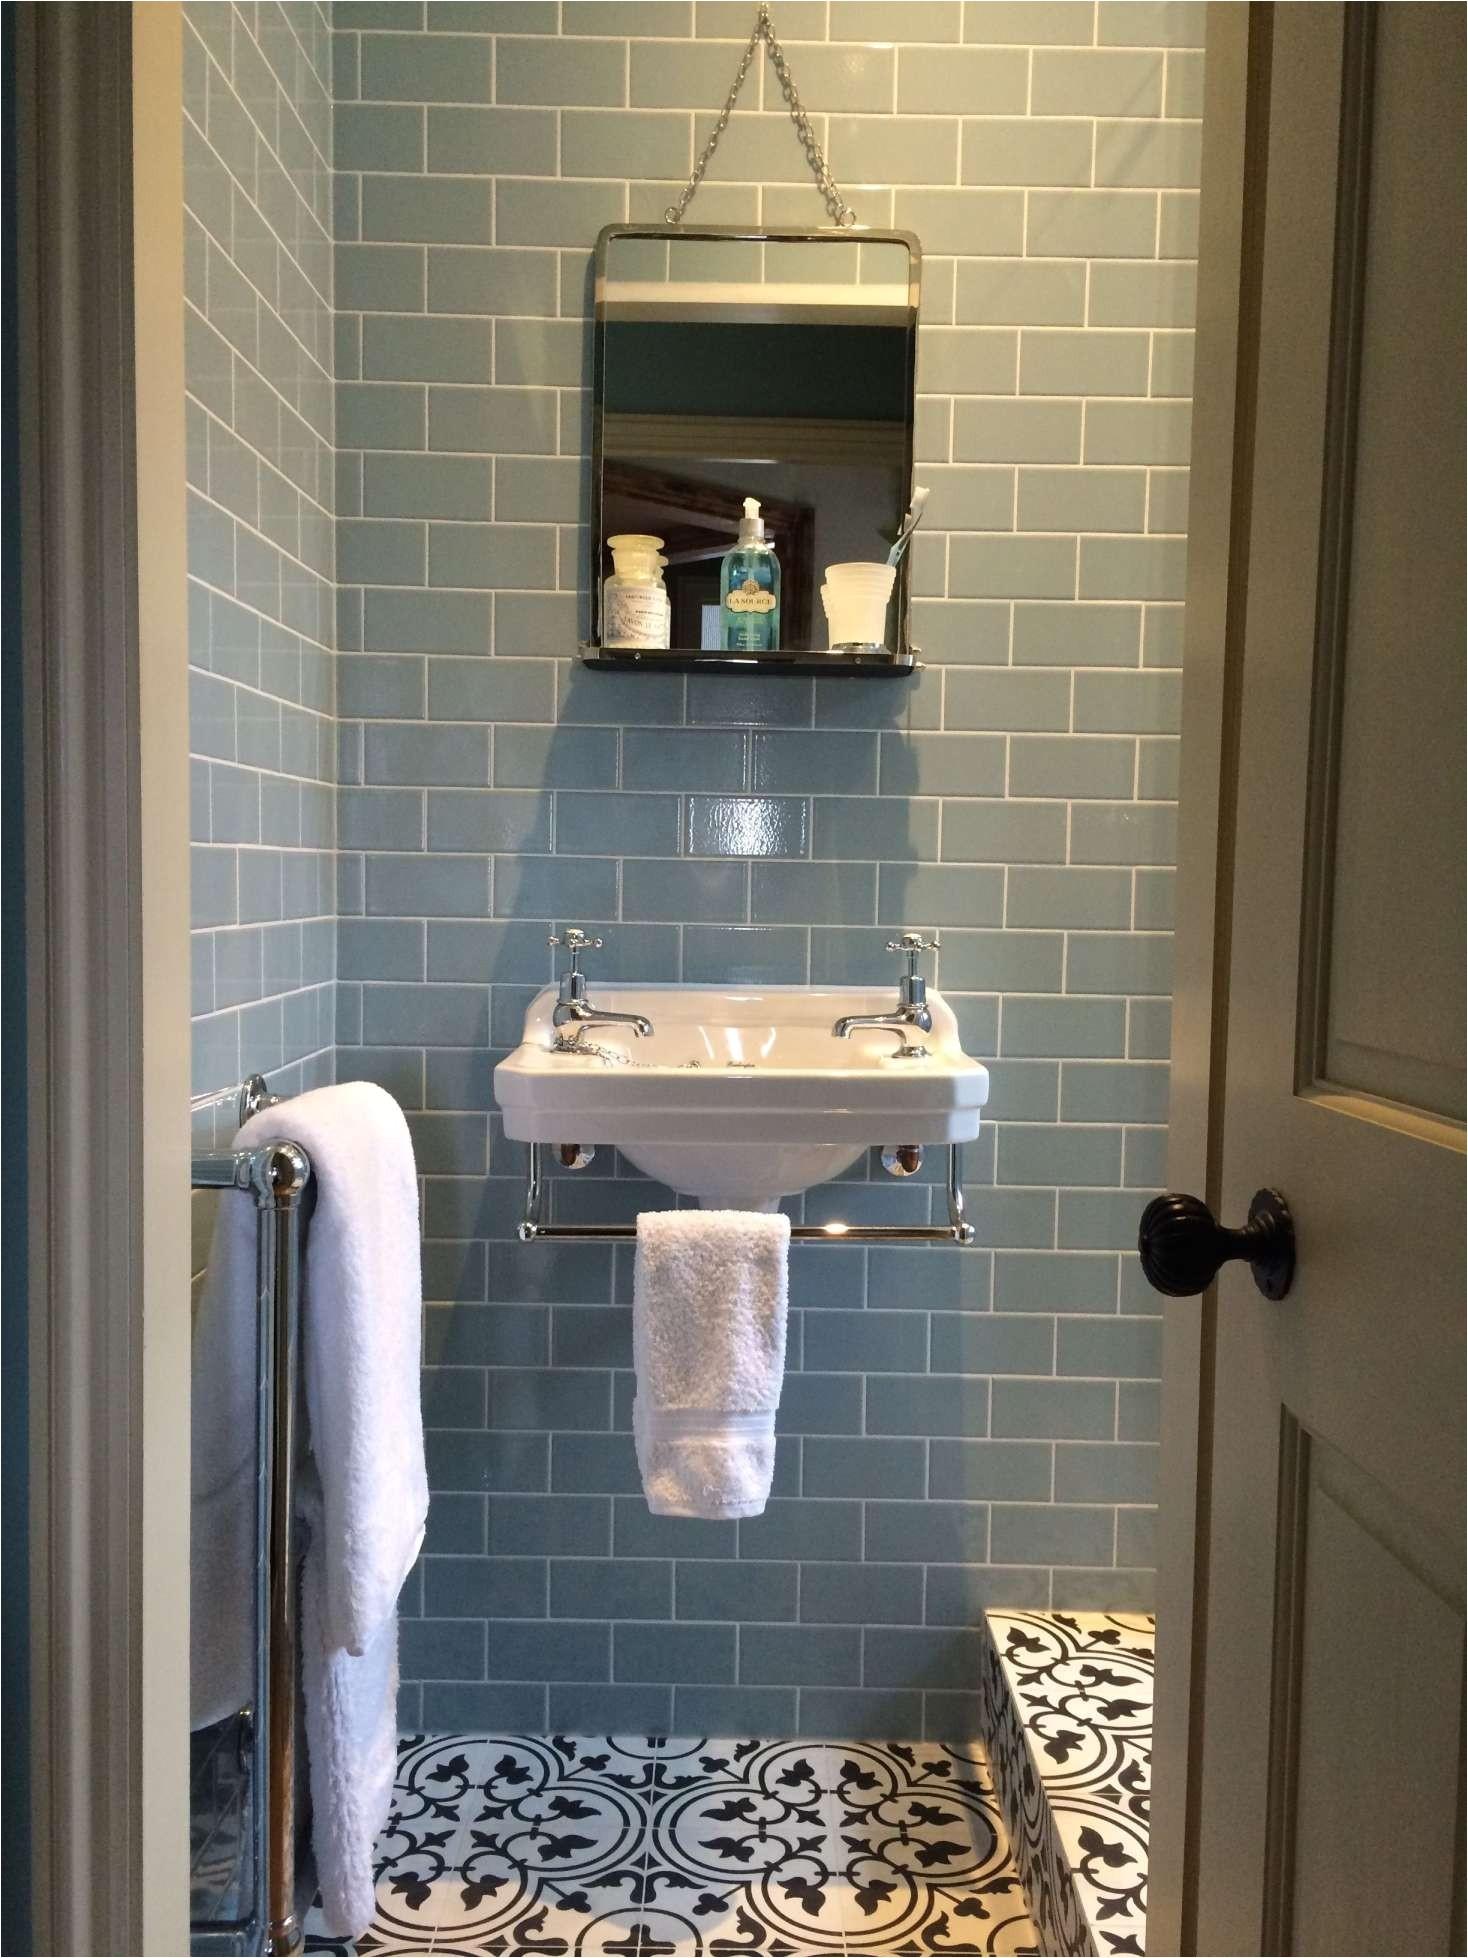 Bathroom Tiles Design Fresh Bathroom Floor Tile Design Ideas New Floor Tiles Mosaic Bathroom 0d